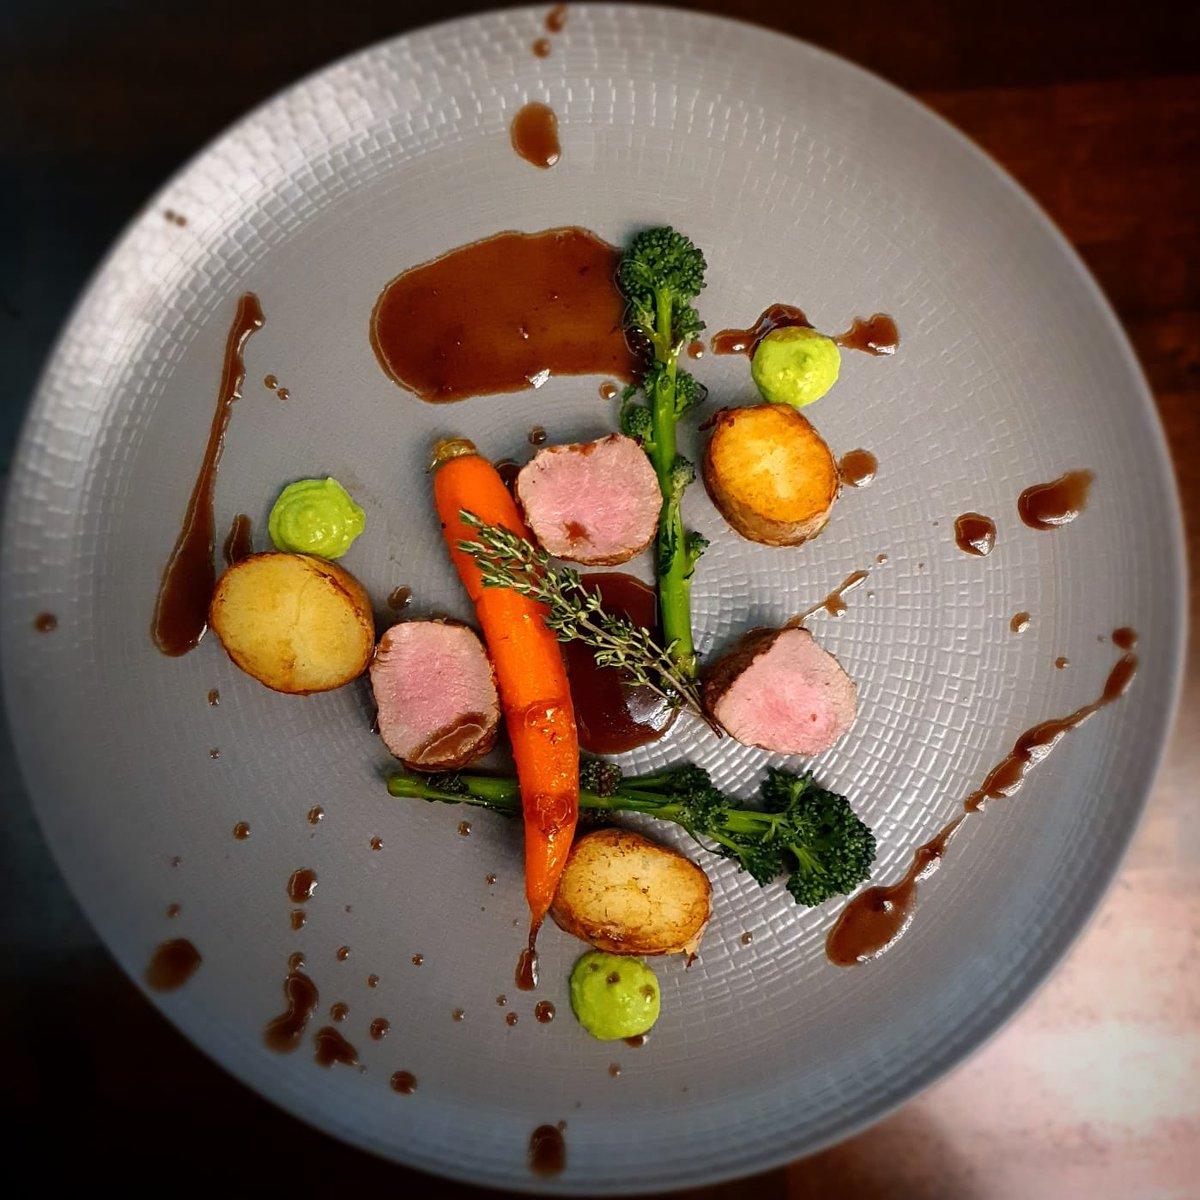 Today's special. Pan seared lamb loin, red wine shallot jus, seasonal veg. Thanks Chef 👩🍳   #dublincitycentre #dublinonourdoorstep #Ourteam #chefgoals #chefteam #dublinfood #dublindining https://t.co/YhFK3IPFy7